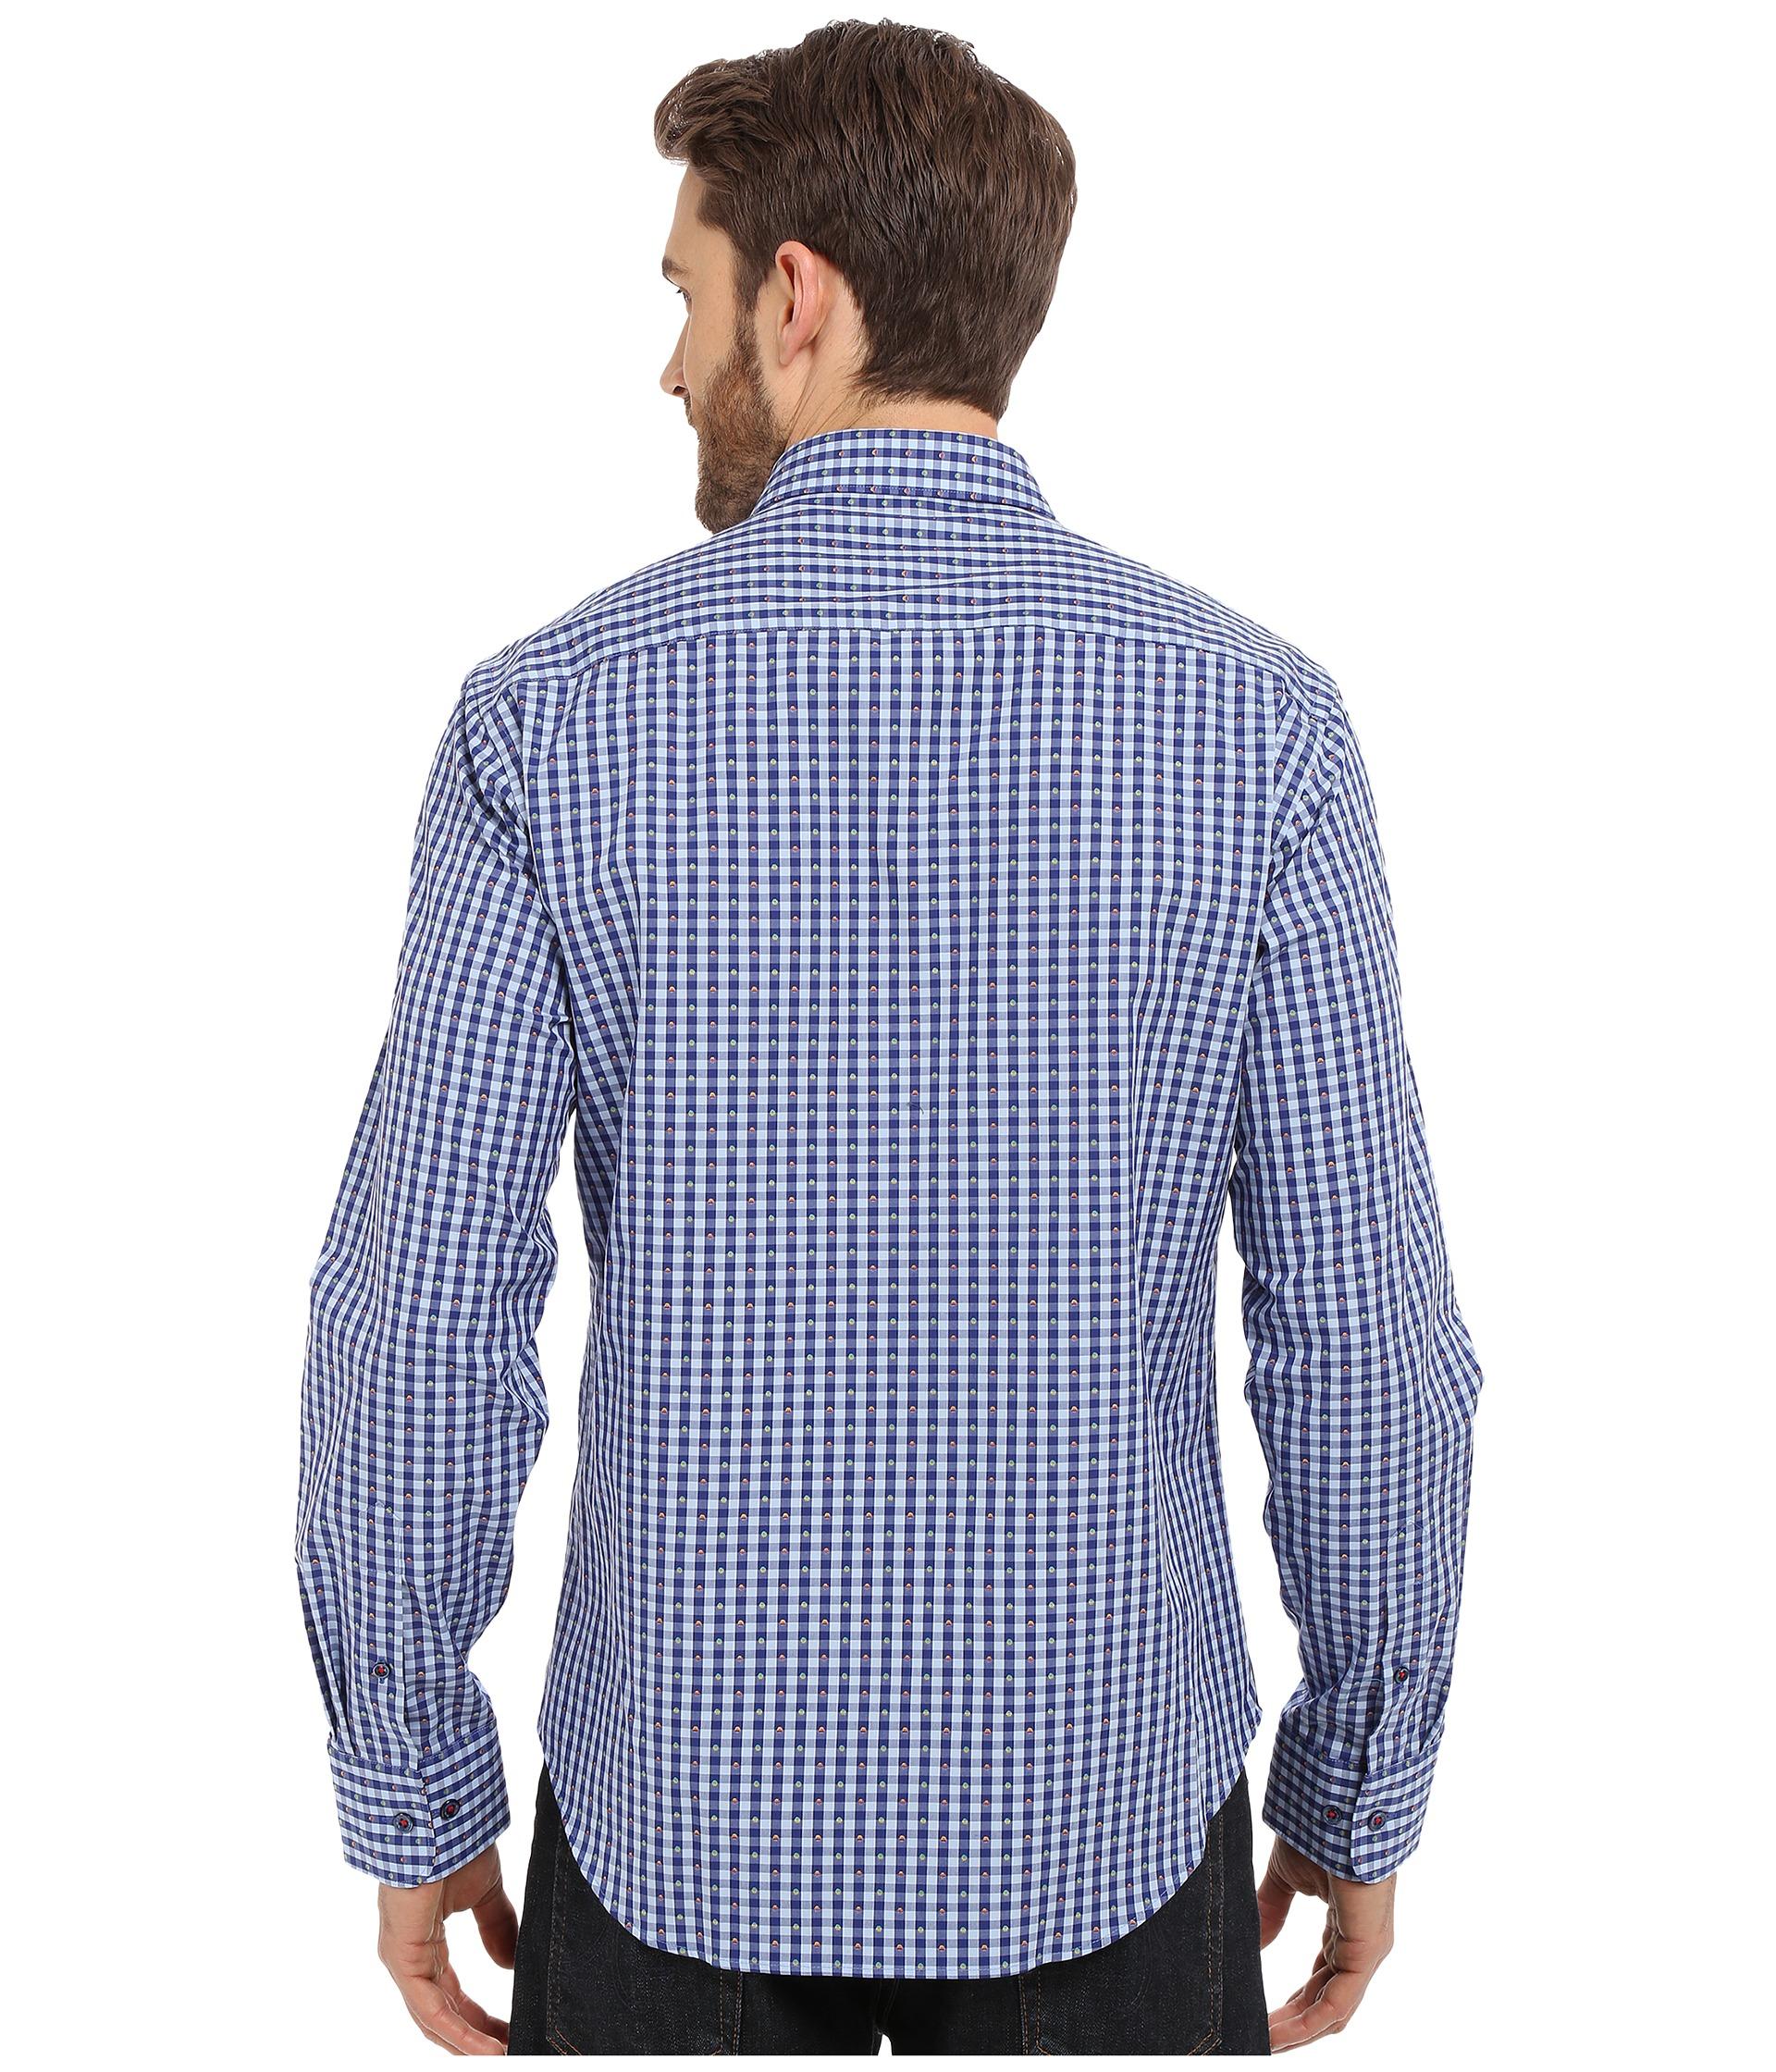 BUGATCHI Mens Long Sleeve Shaped Fit Button Down Spread Collar Woven Shirt XXL Midnight